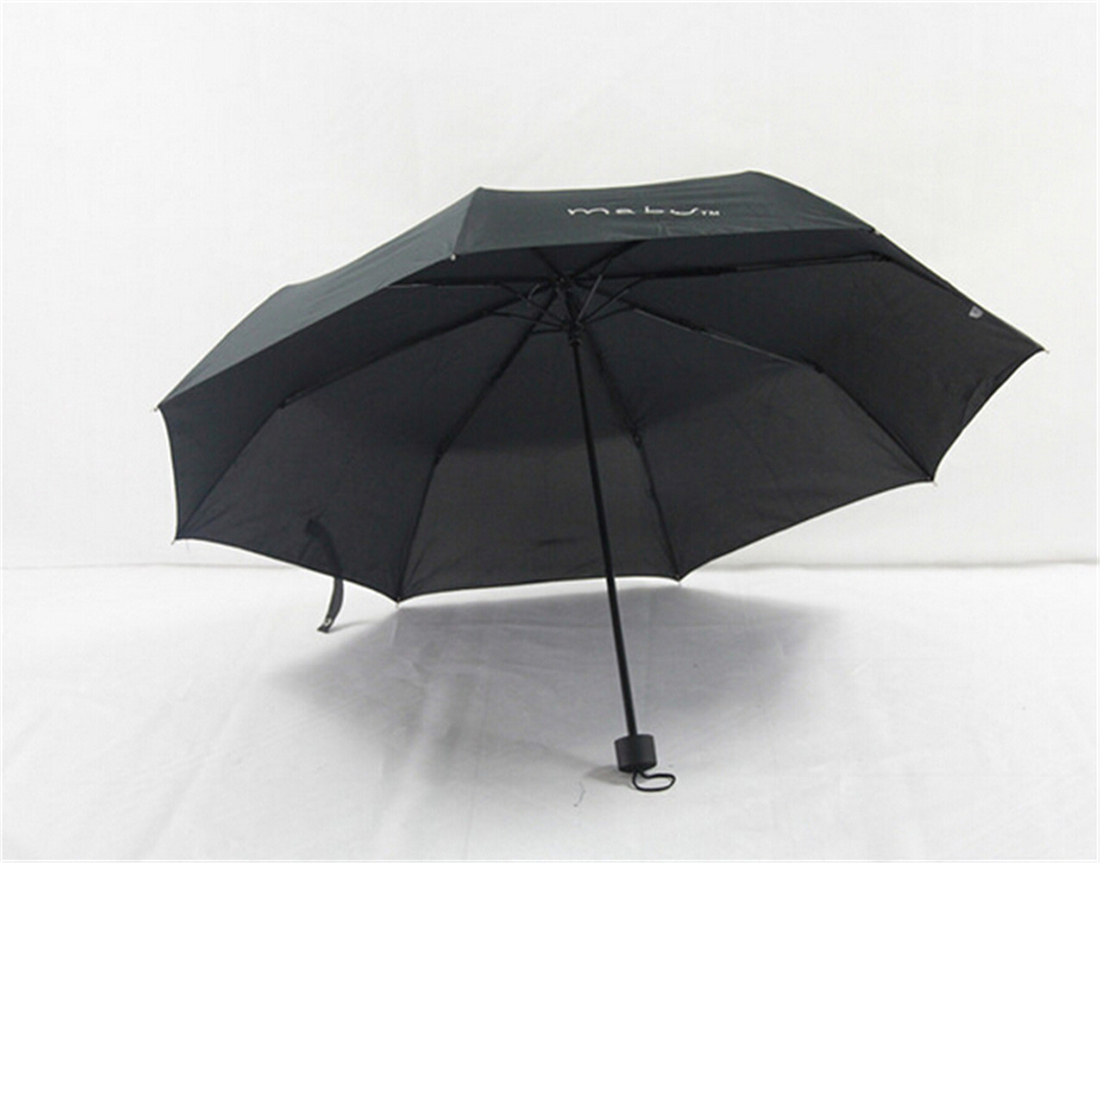 15.99$  Buy now - http://vilhw.justgood.pw/vig/item.php?t=7edhja5227 - Folding Umbrella Compact Light weight Anti-UV Rain Sun Umbrella Black